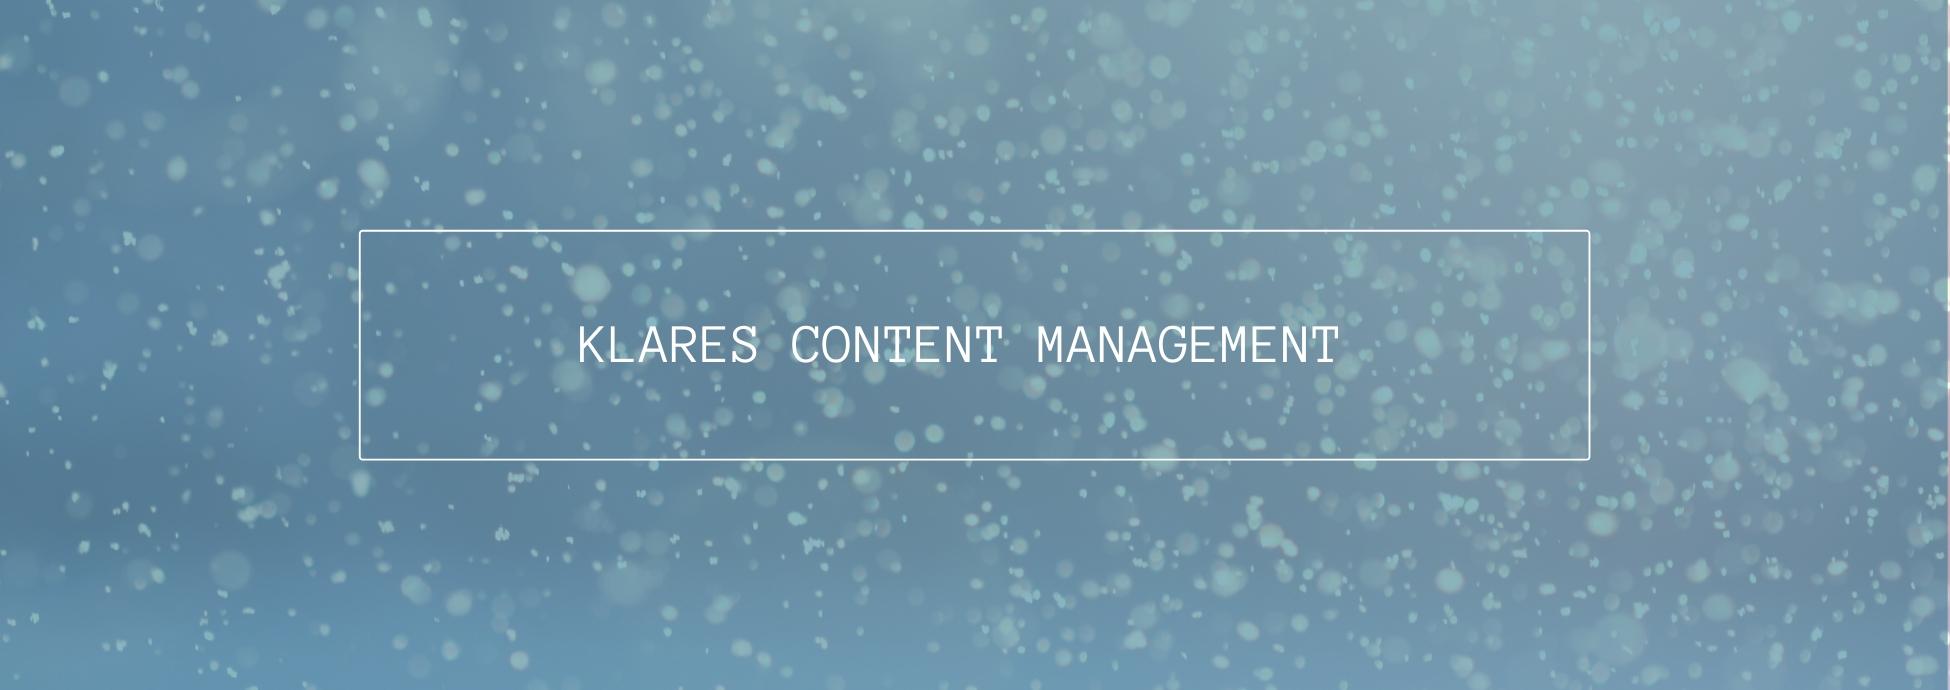 header content management